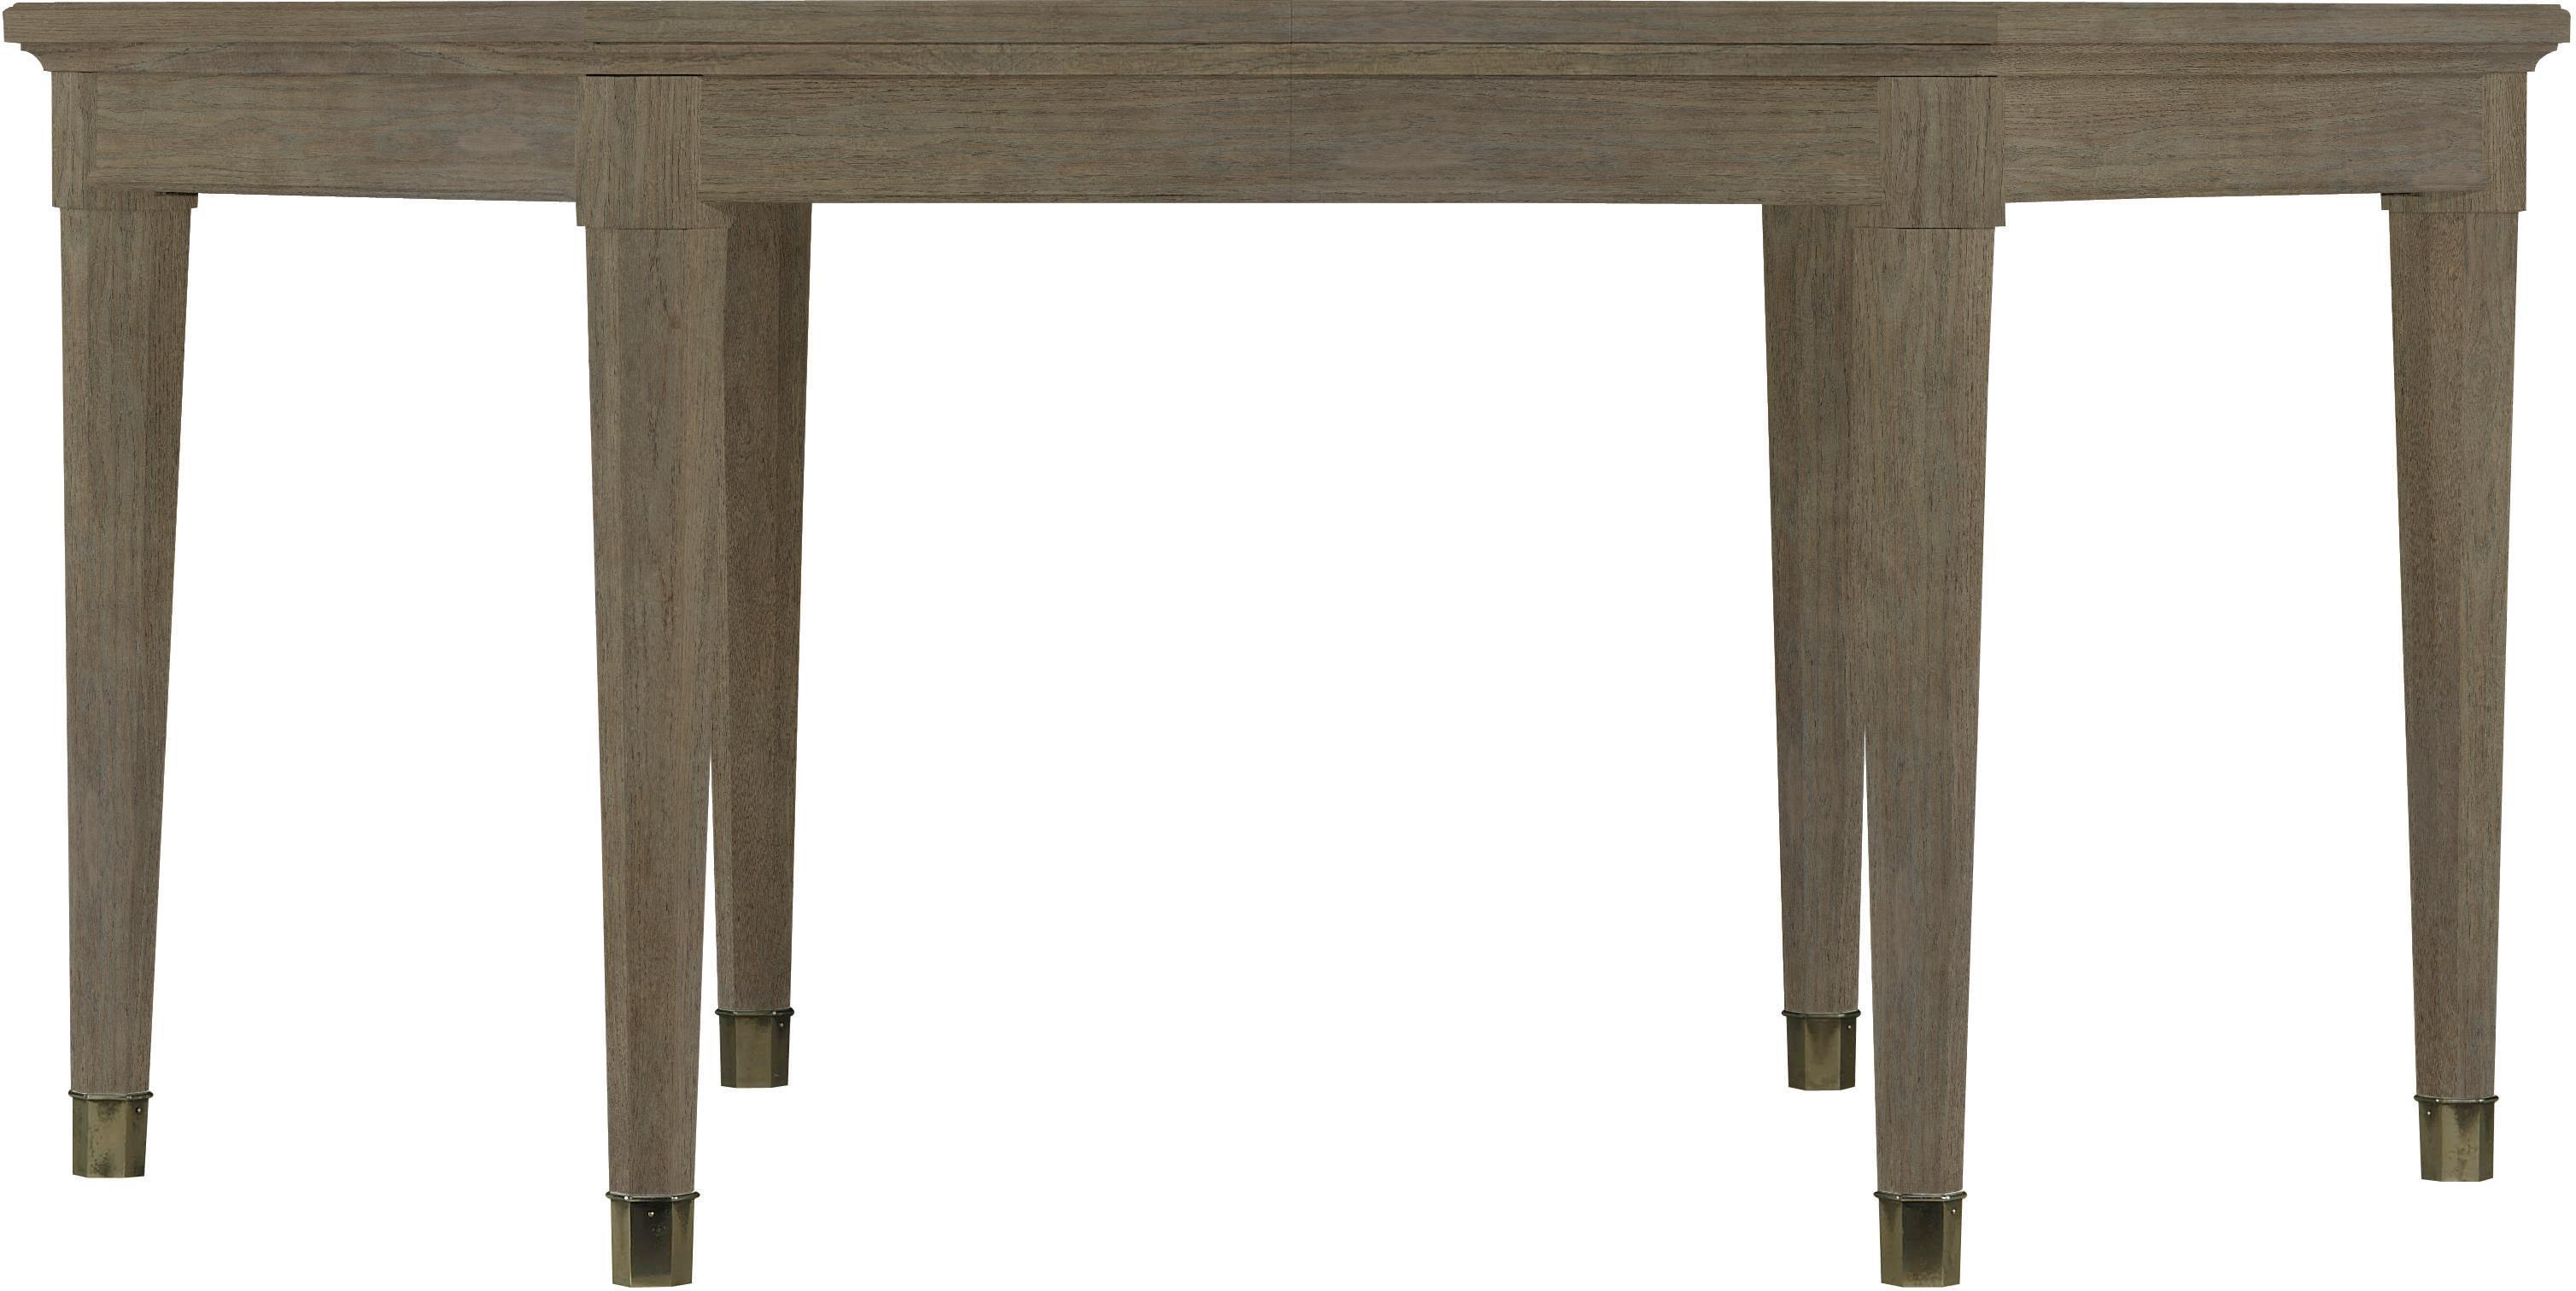 Stanley Furniture Coastal Living Resort Soledad Promenade Leg Table - Item Number: 062-31-32